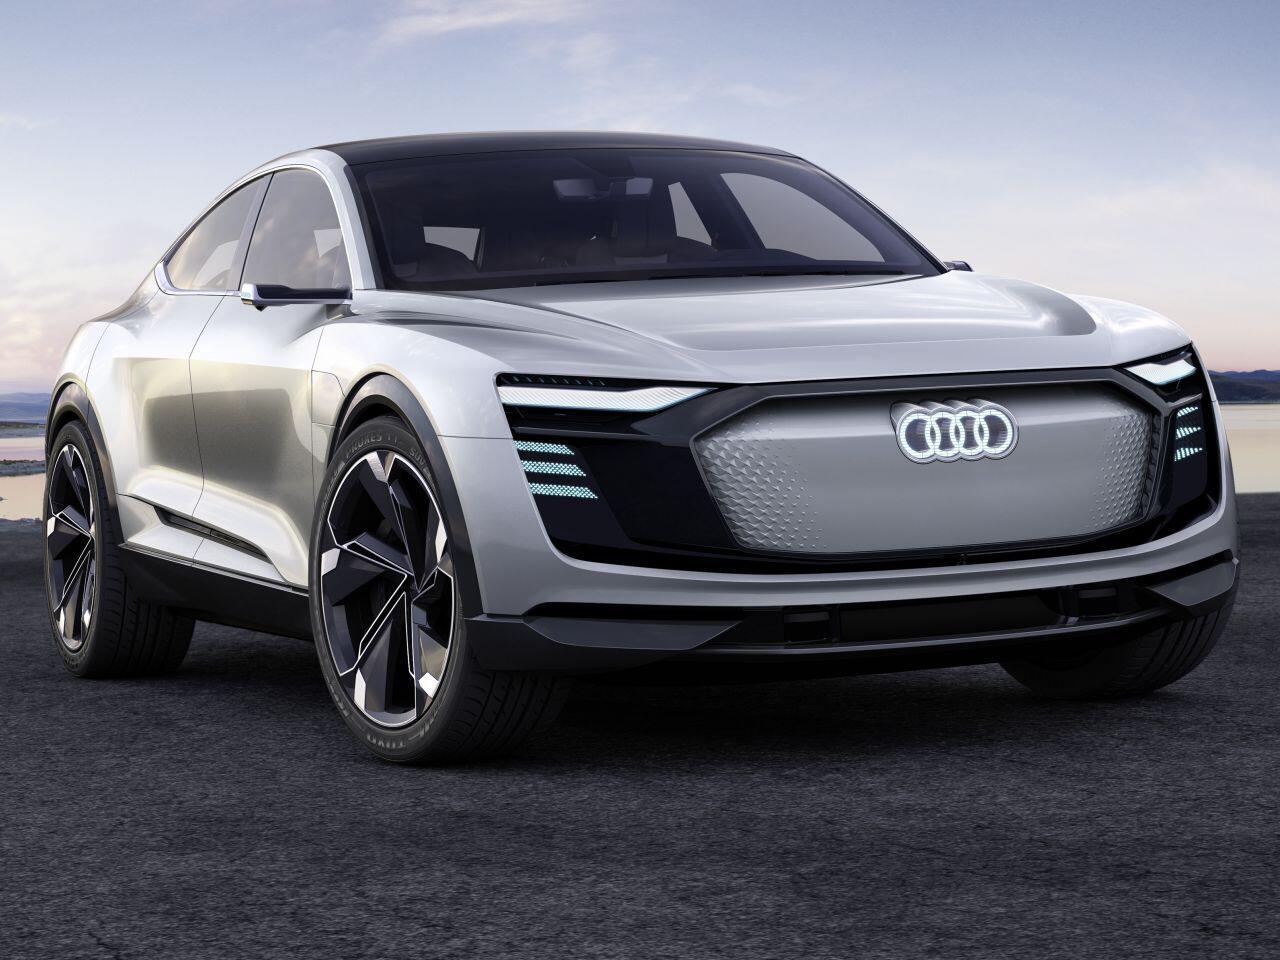 Bild zu Audi e-tron Sportback concept